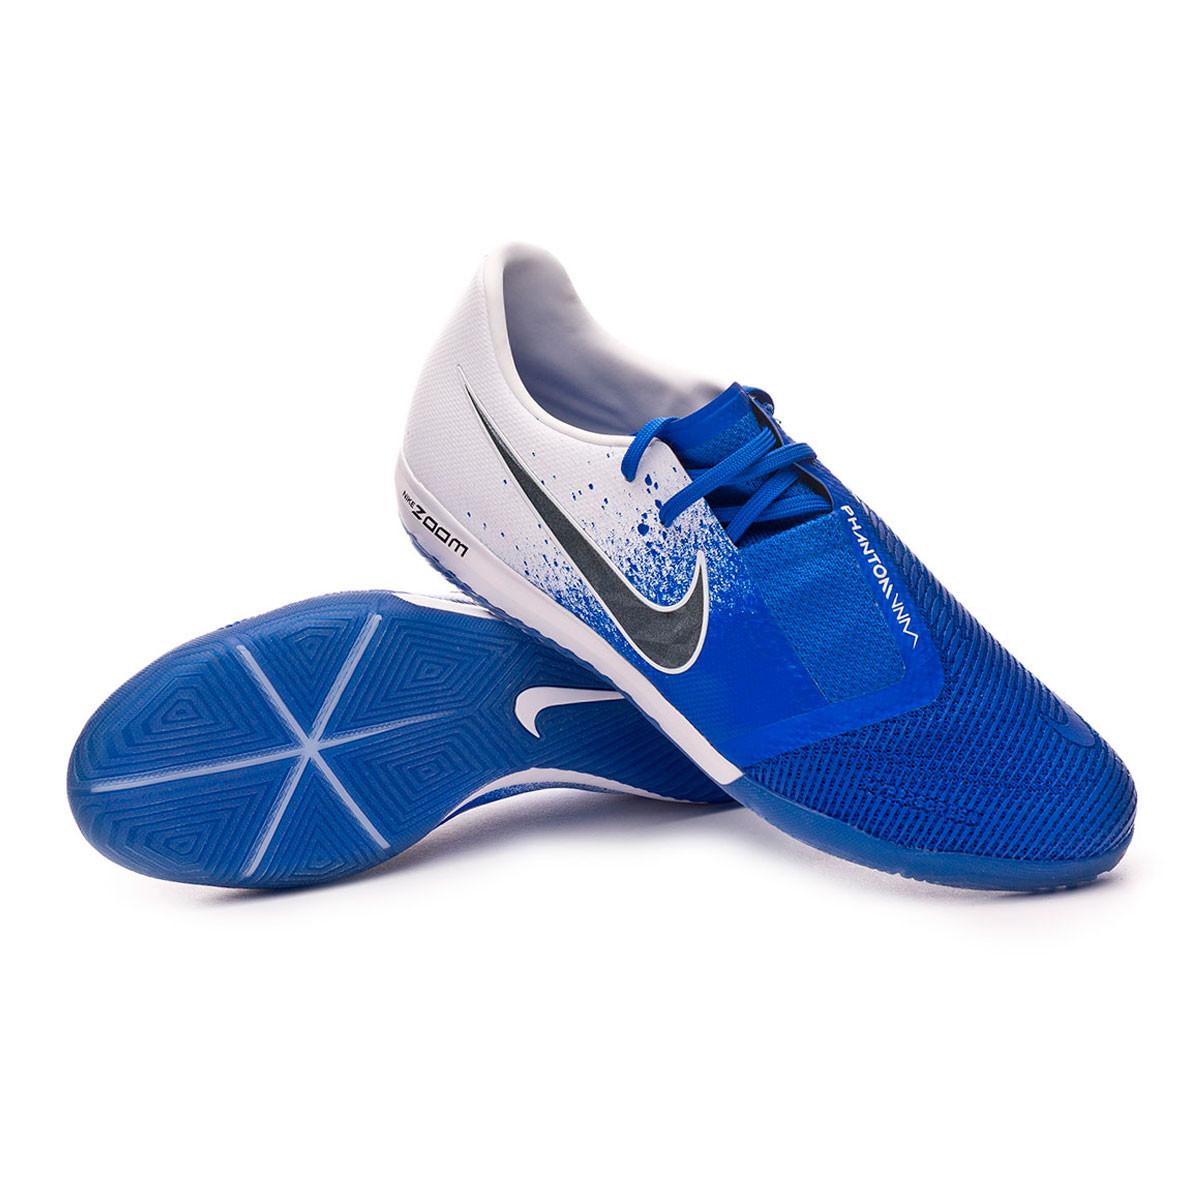 Malawi roto Inferior  Futsal Boot Nike Zoom Phantom Venom Pro IC White-Black-Racer blue -  Football store Fútbol Emotion